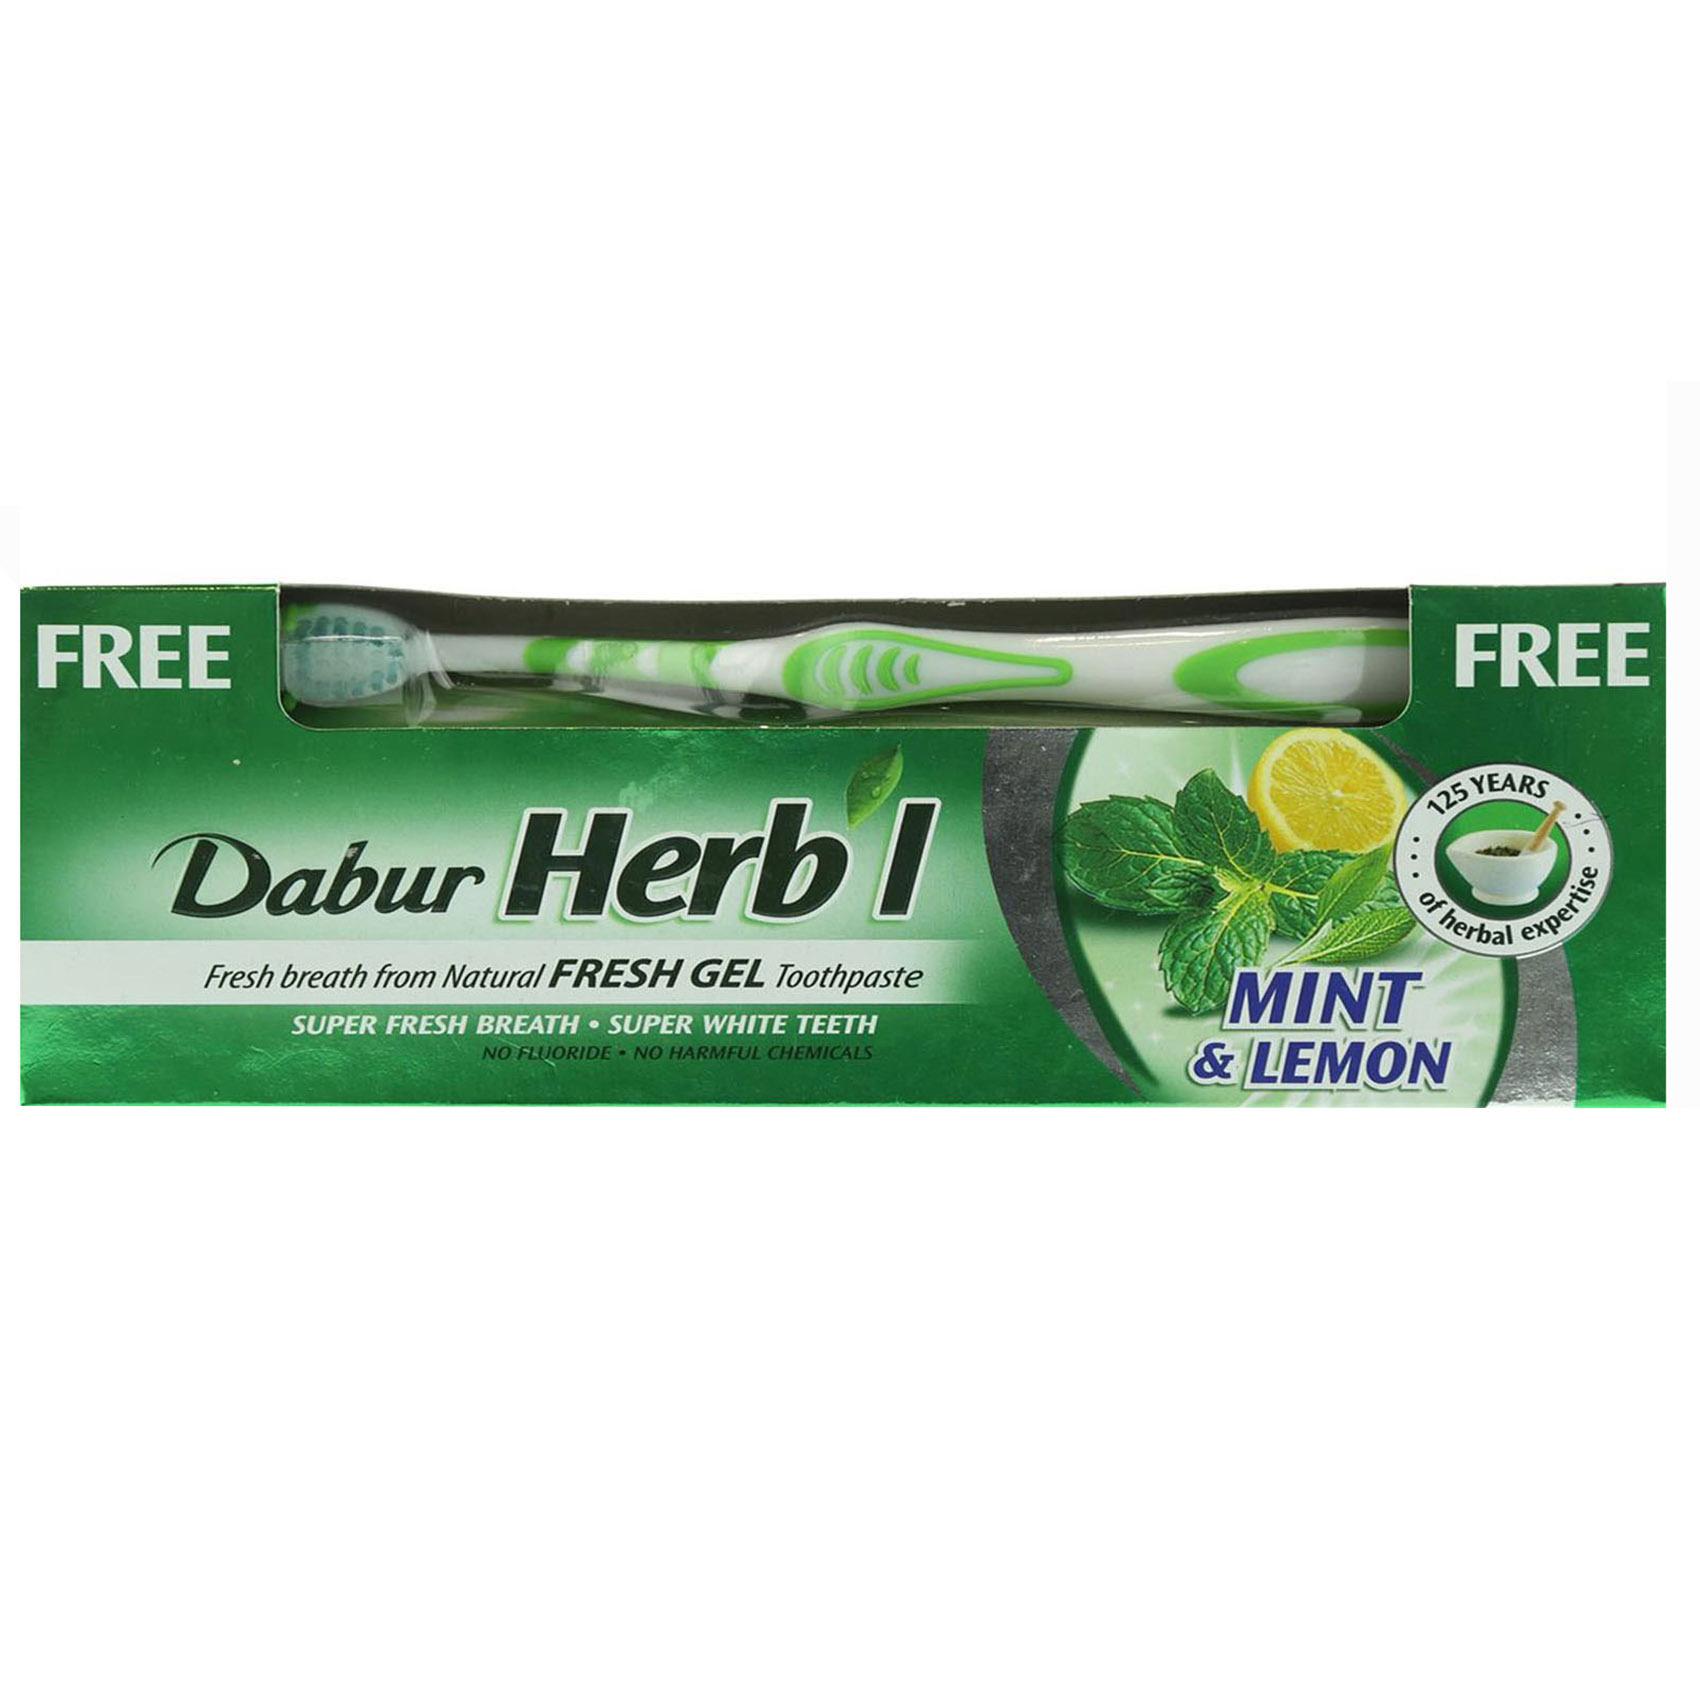 DABUR HRBAL FRSH GEL 150G BRSH FREE